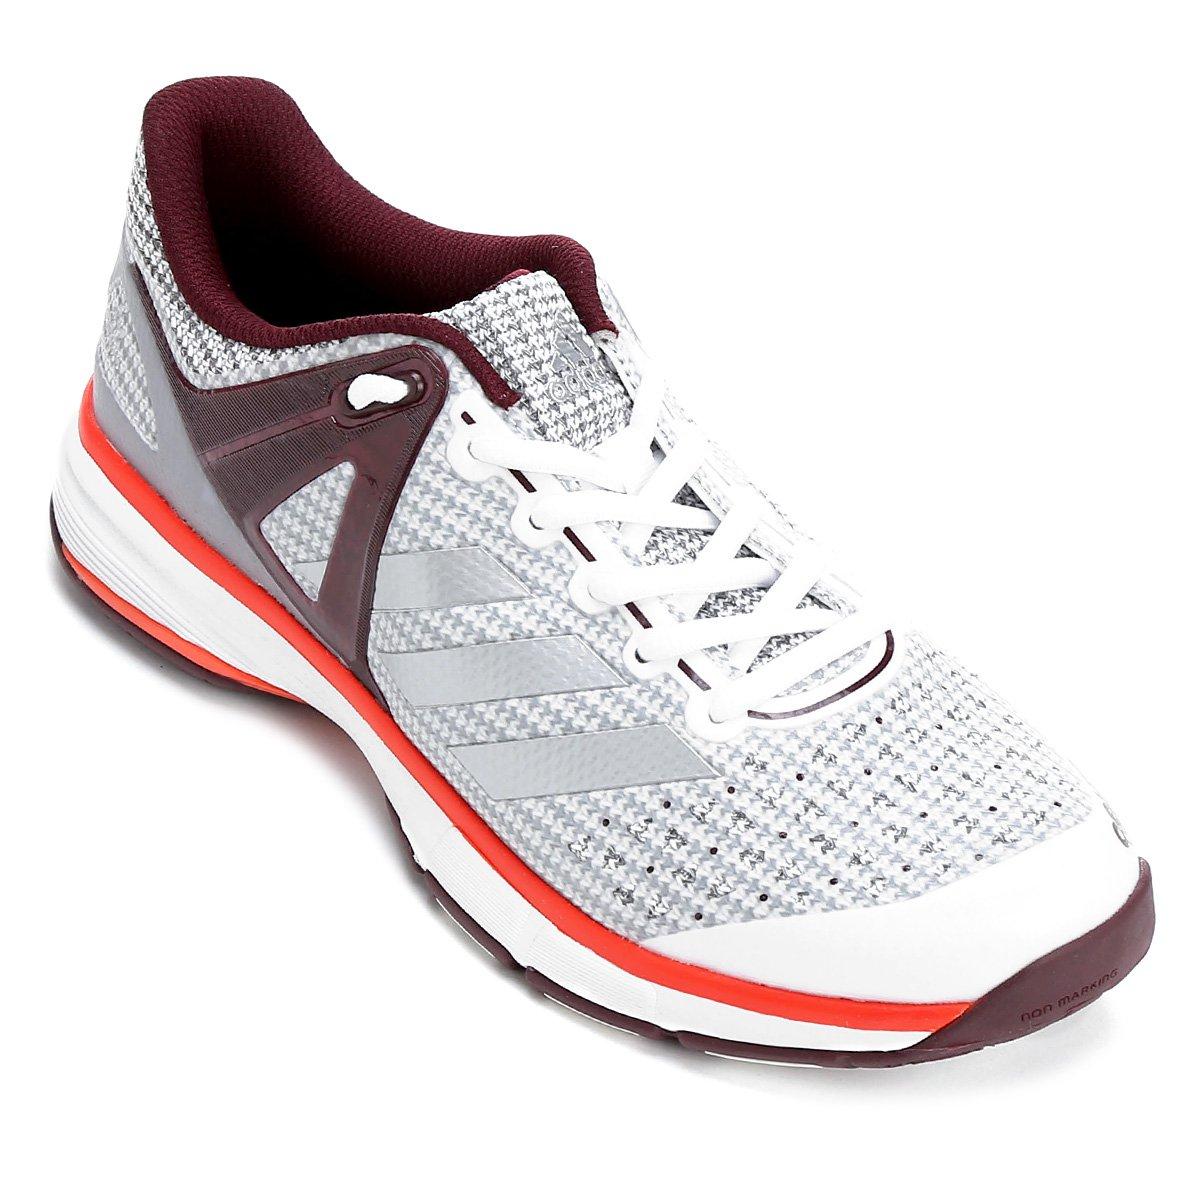 d20edd7d37f16 Tênis para Handebol Adidas